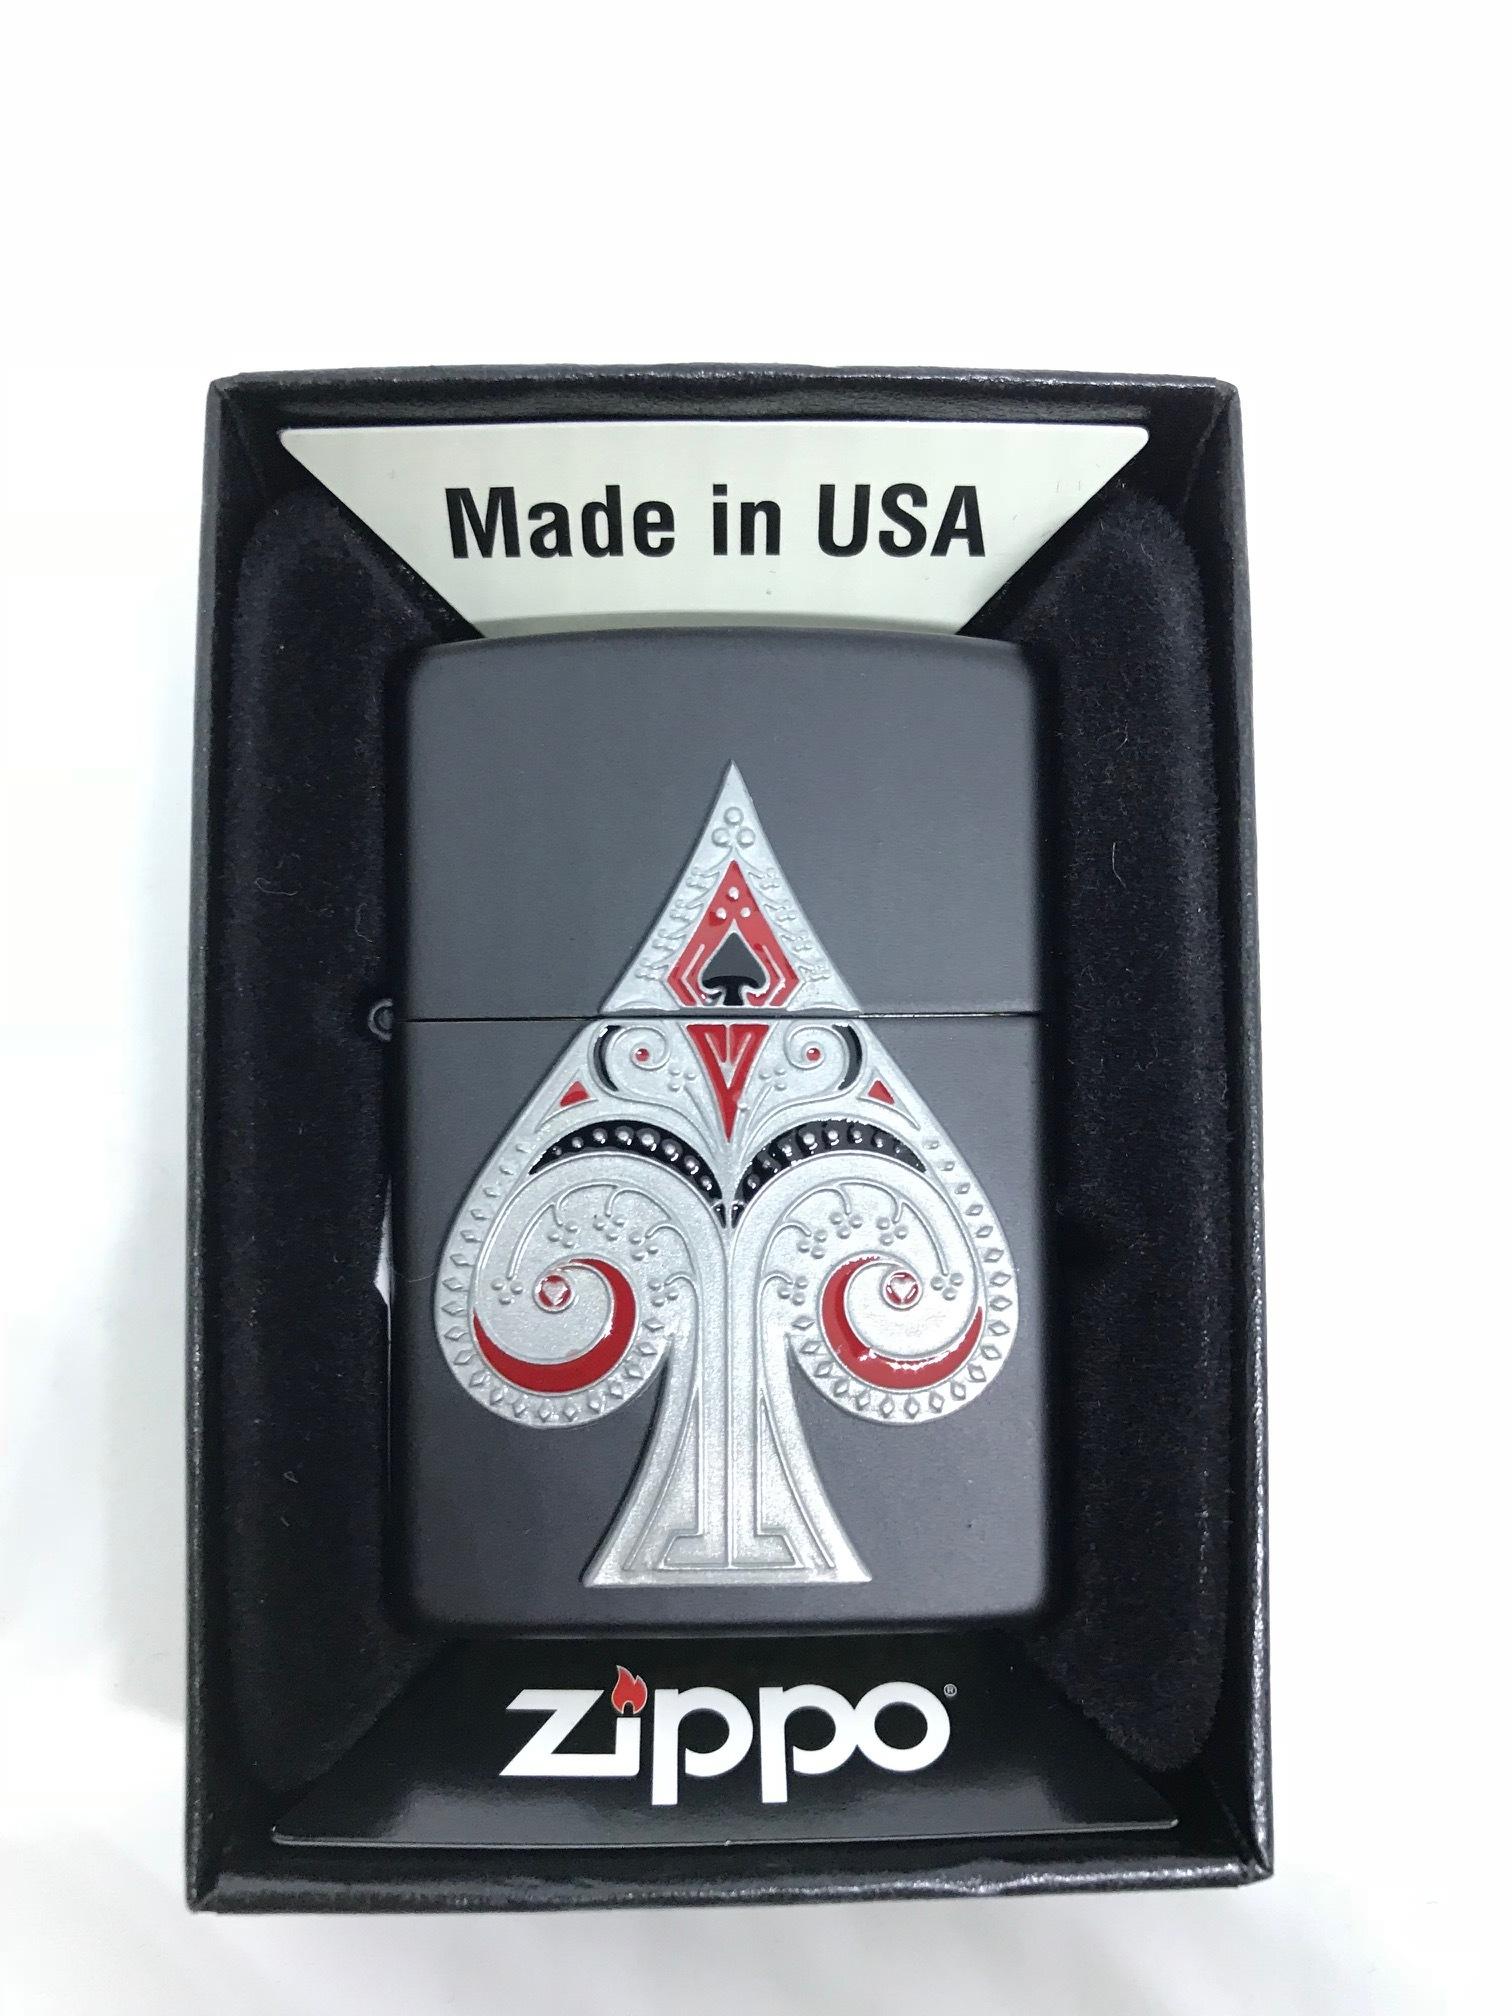 Zippo Spade Emblem son den ntz567 2